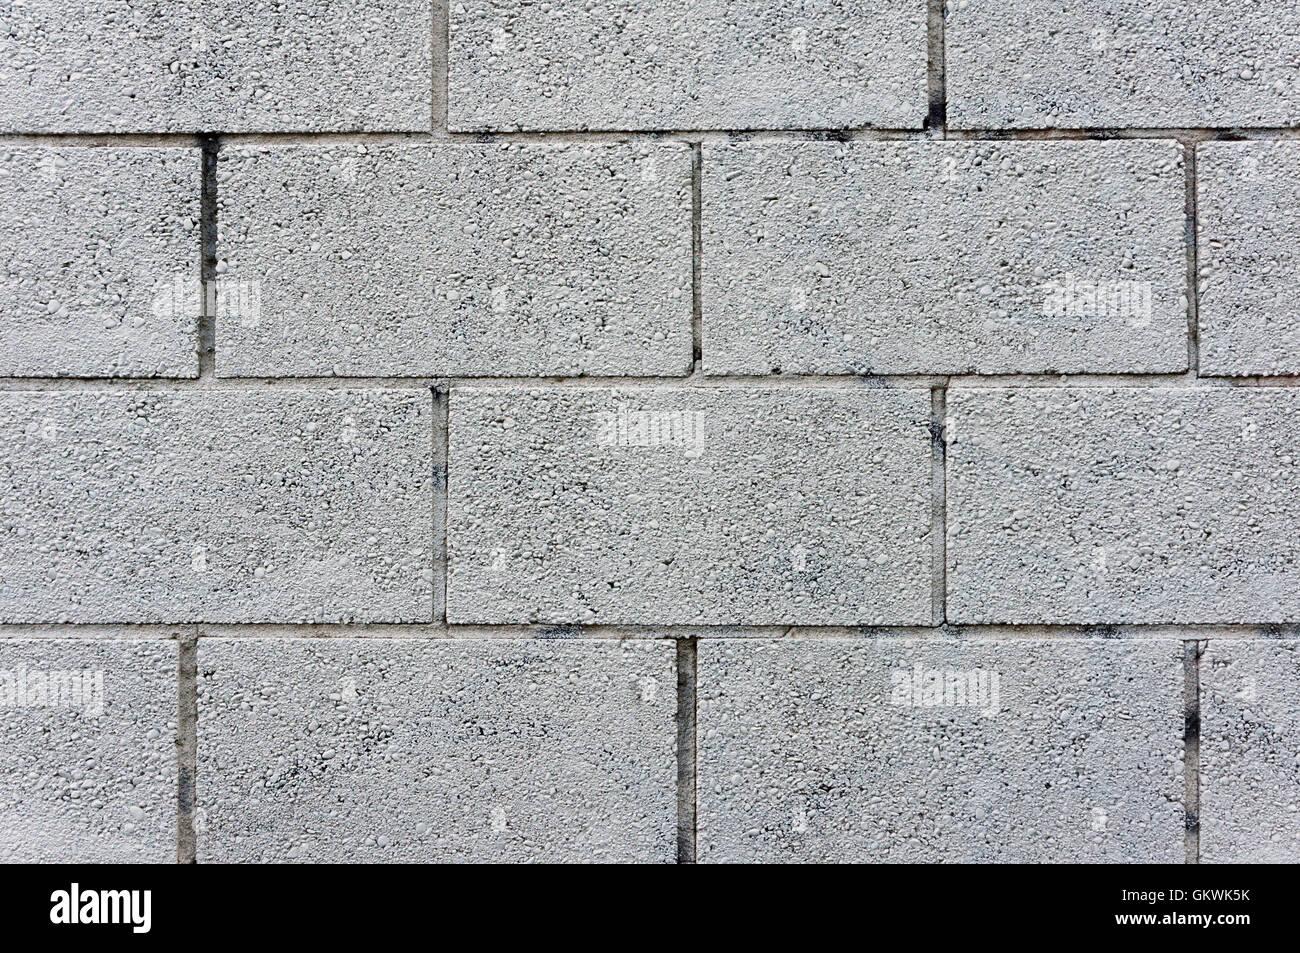 Rectangular concrete block wall background stock photo for Concrete block walls design